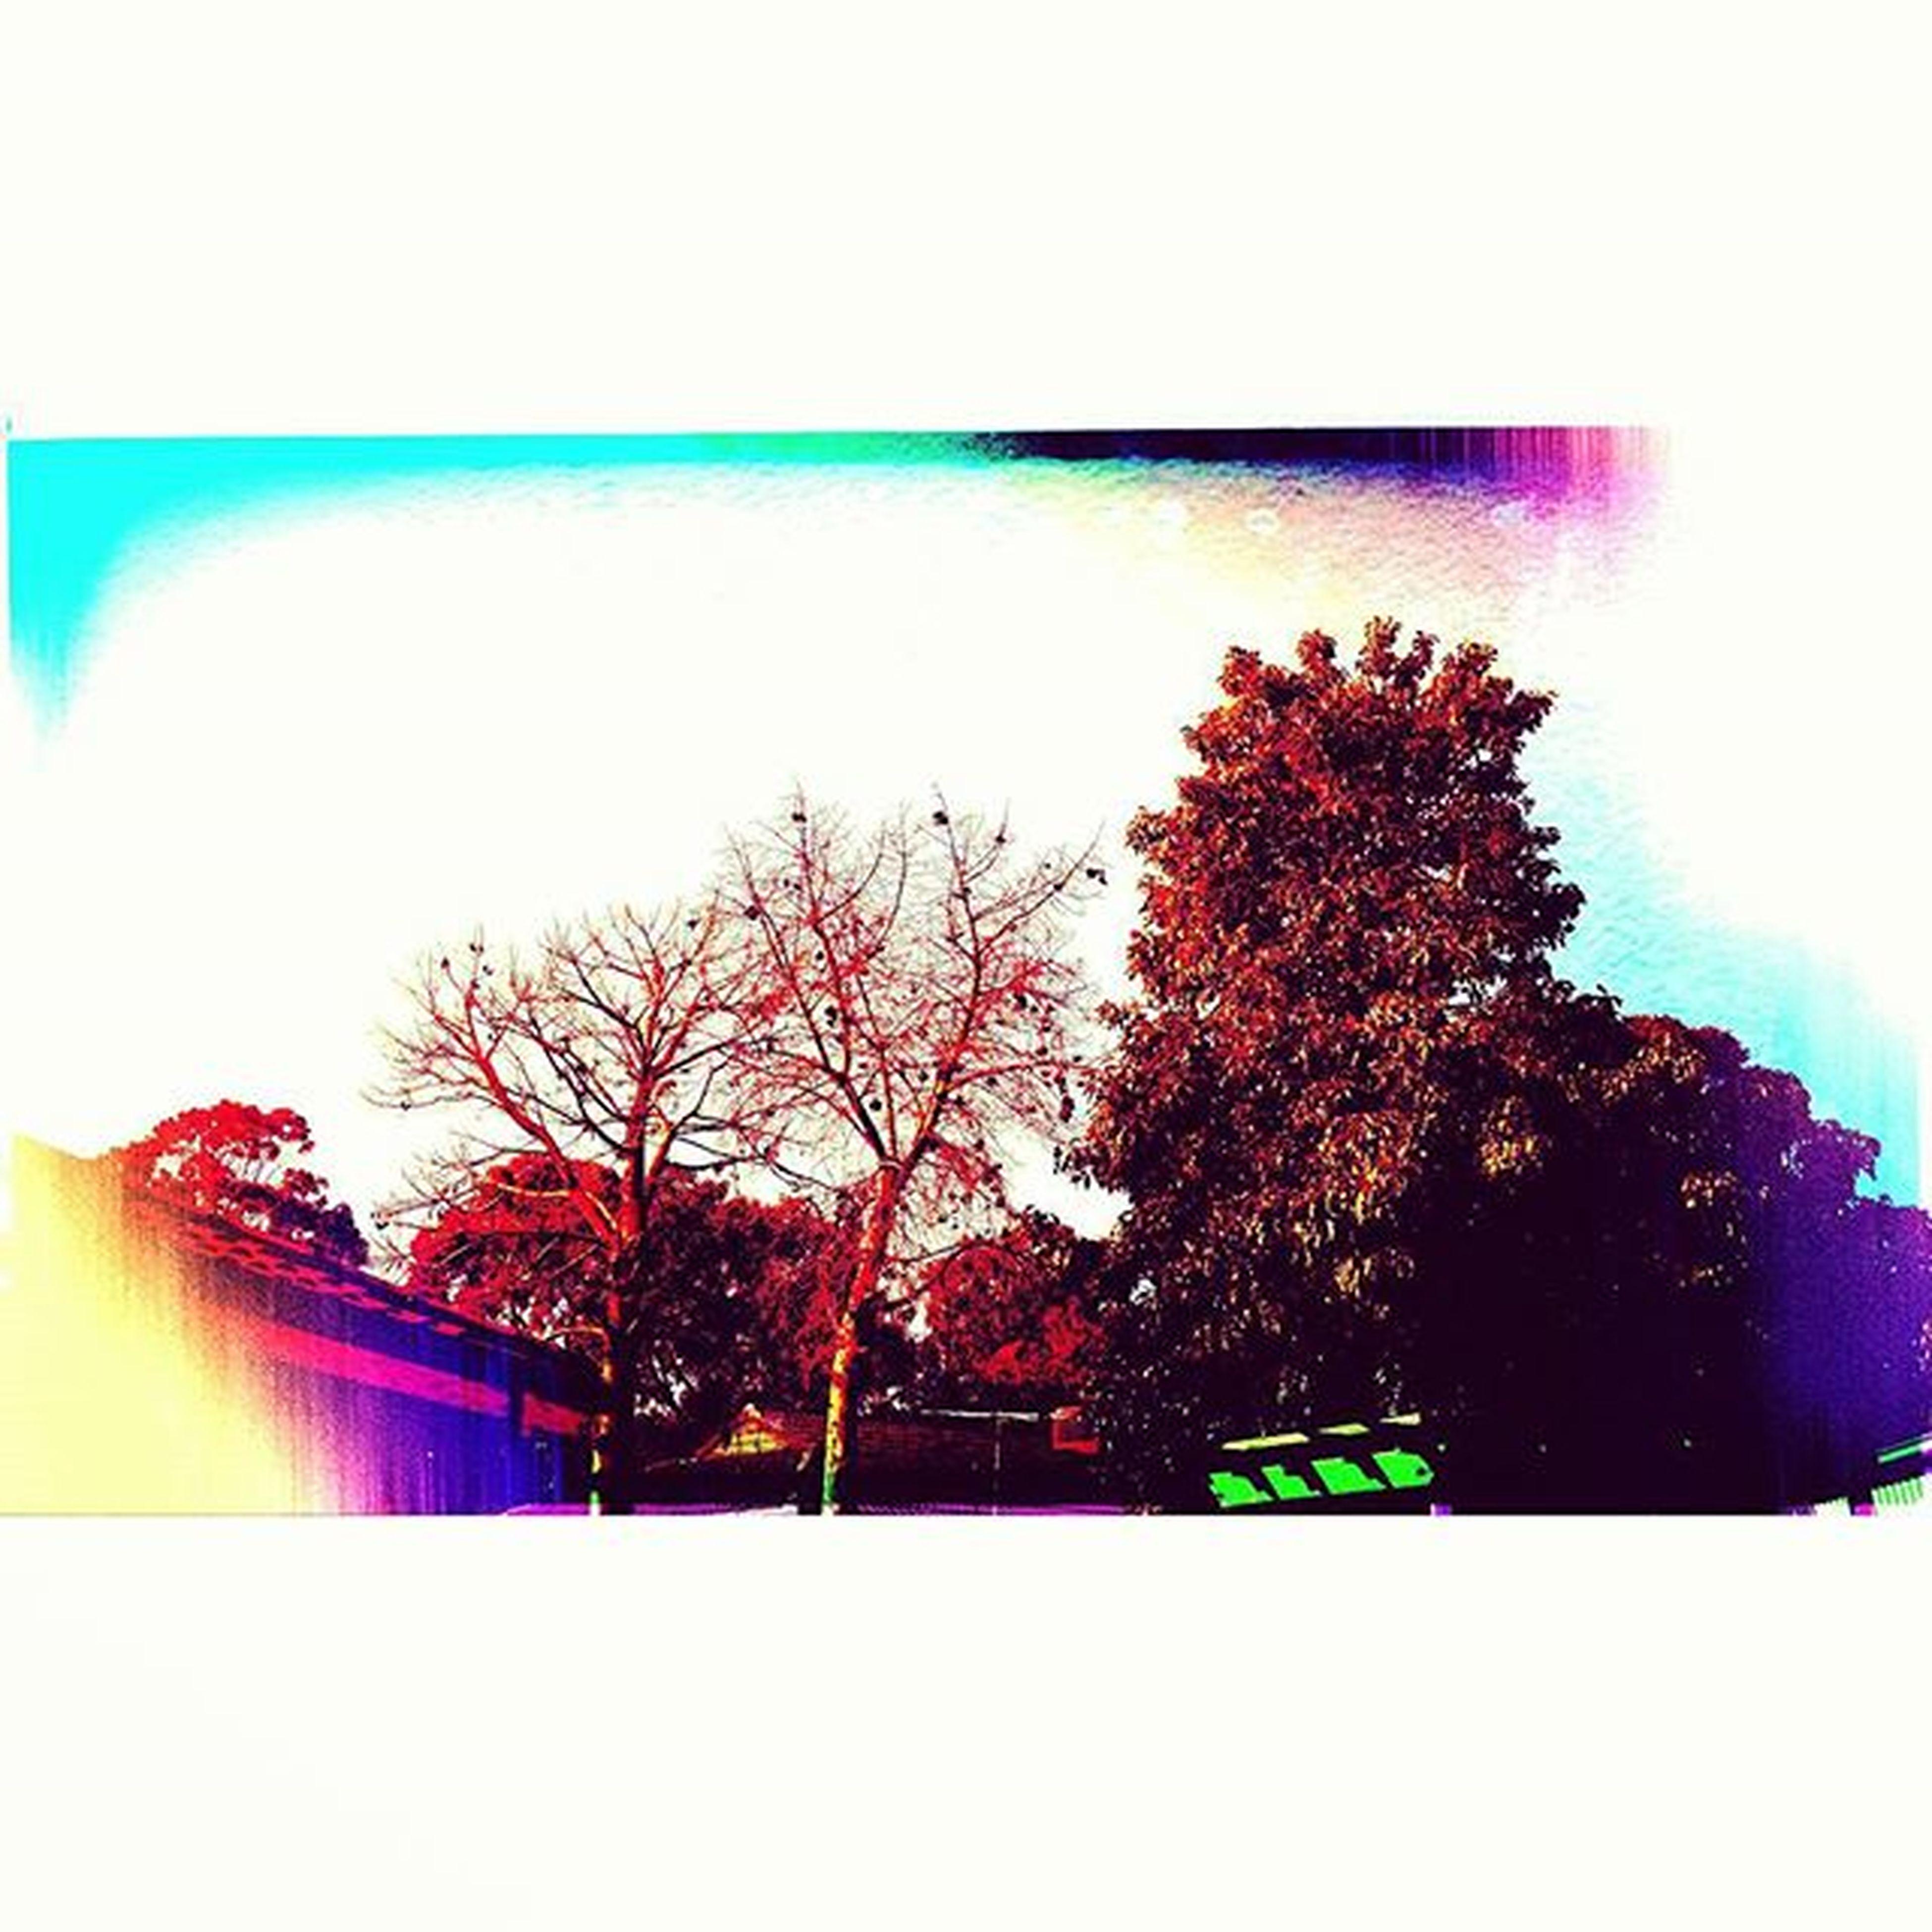 SunnySaturday Middleofwinter Adelaideburbs Colourful toonicetostayindoors lovesouthaustralia feelinggrateful luckygirl PicsArt